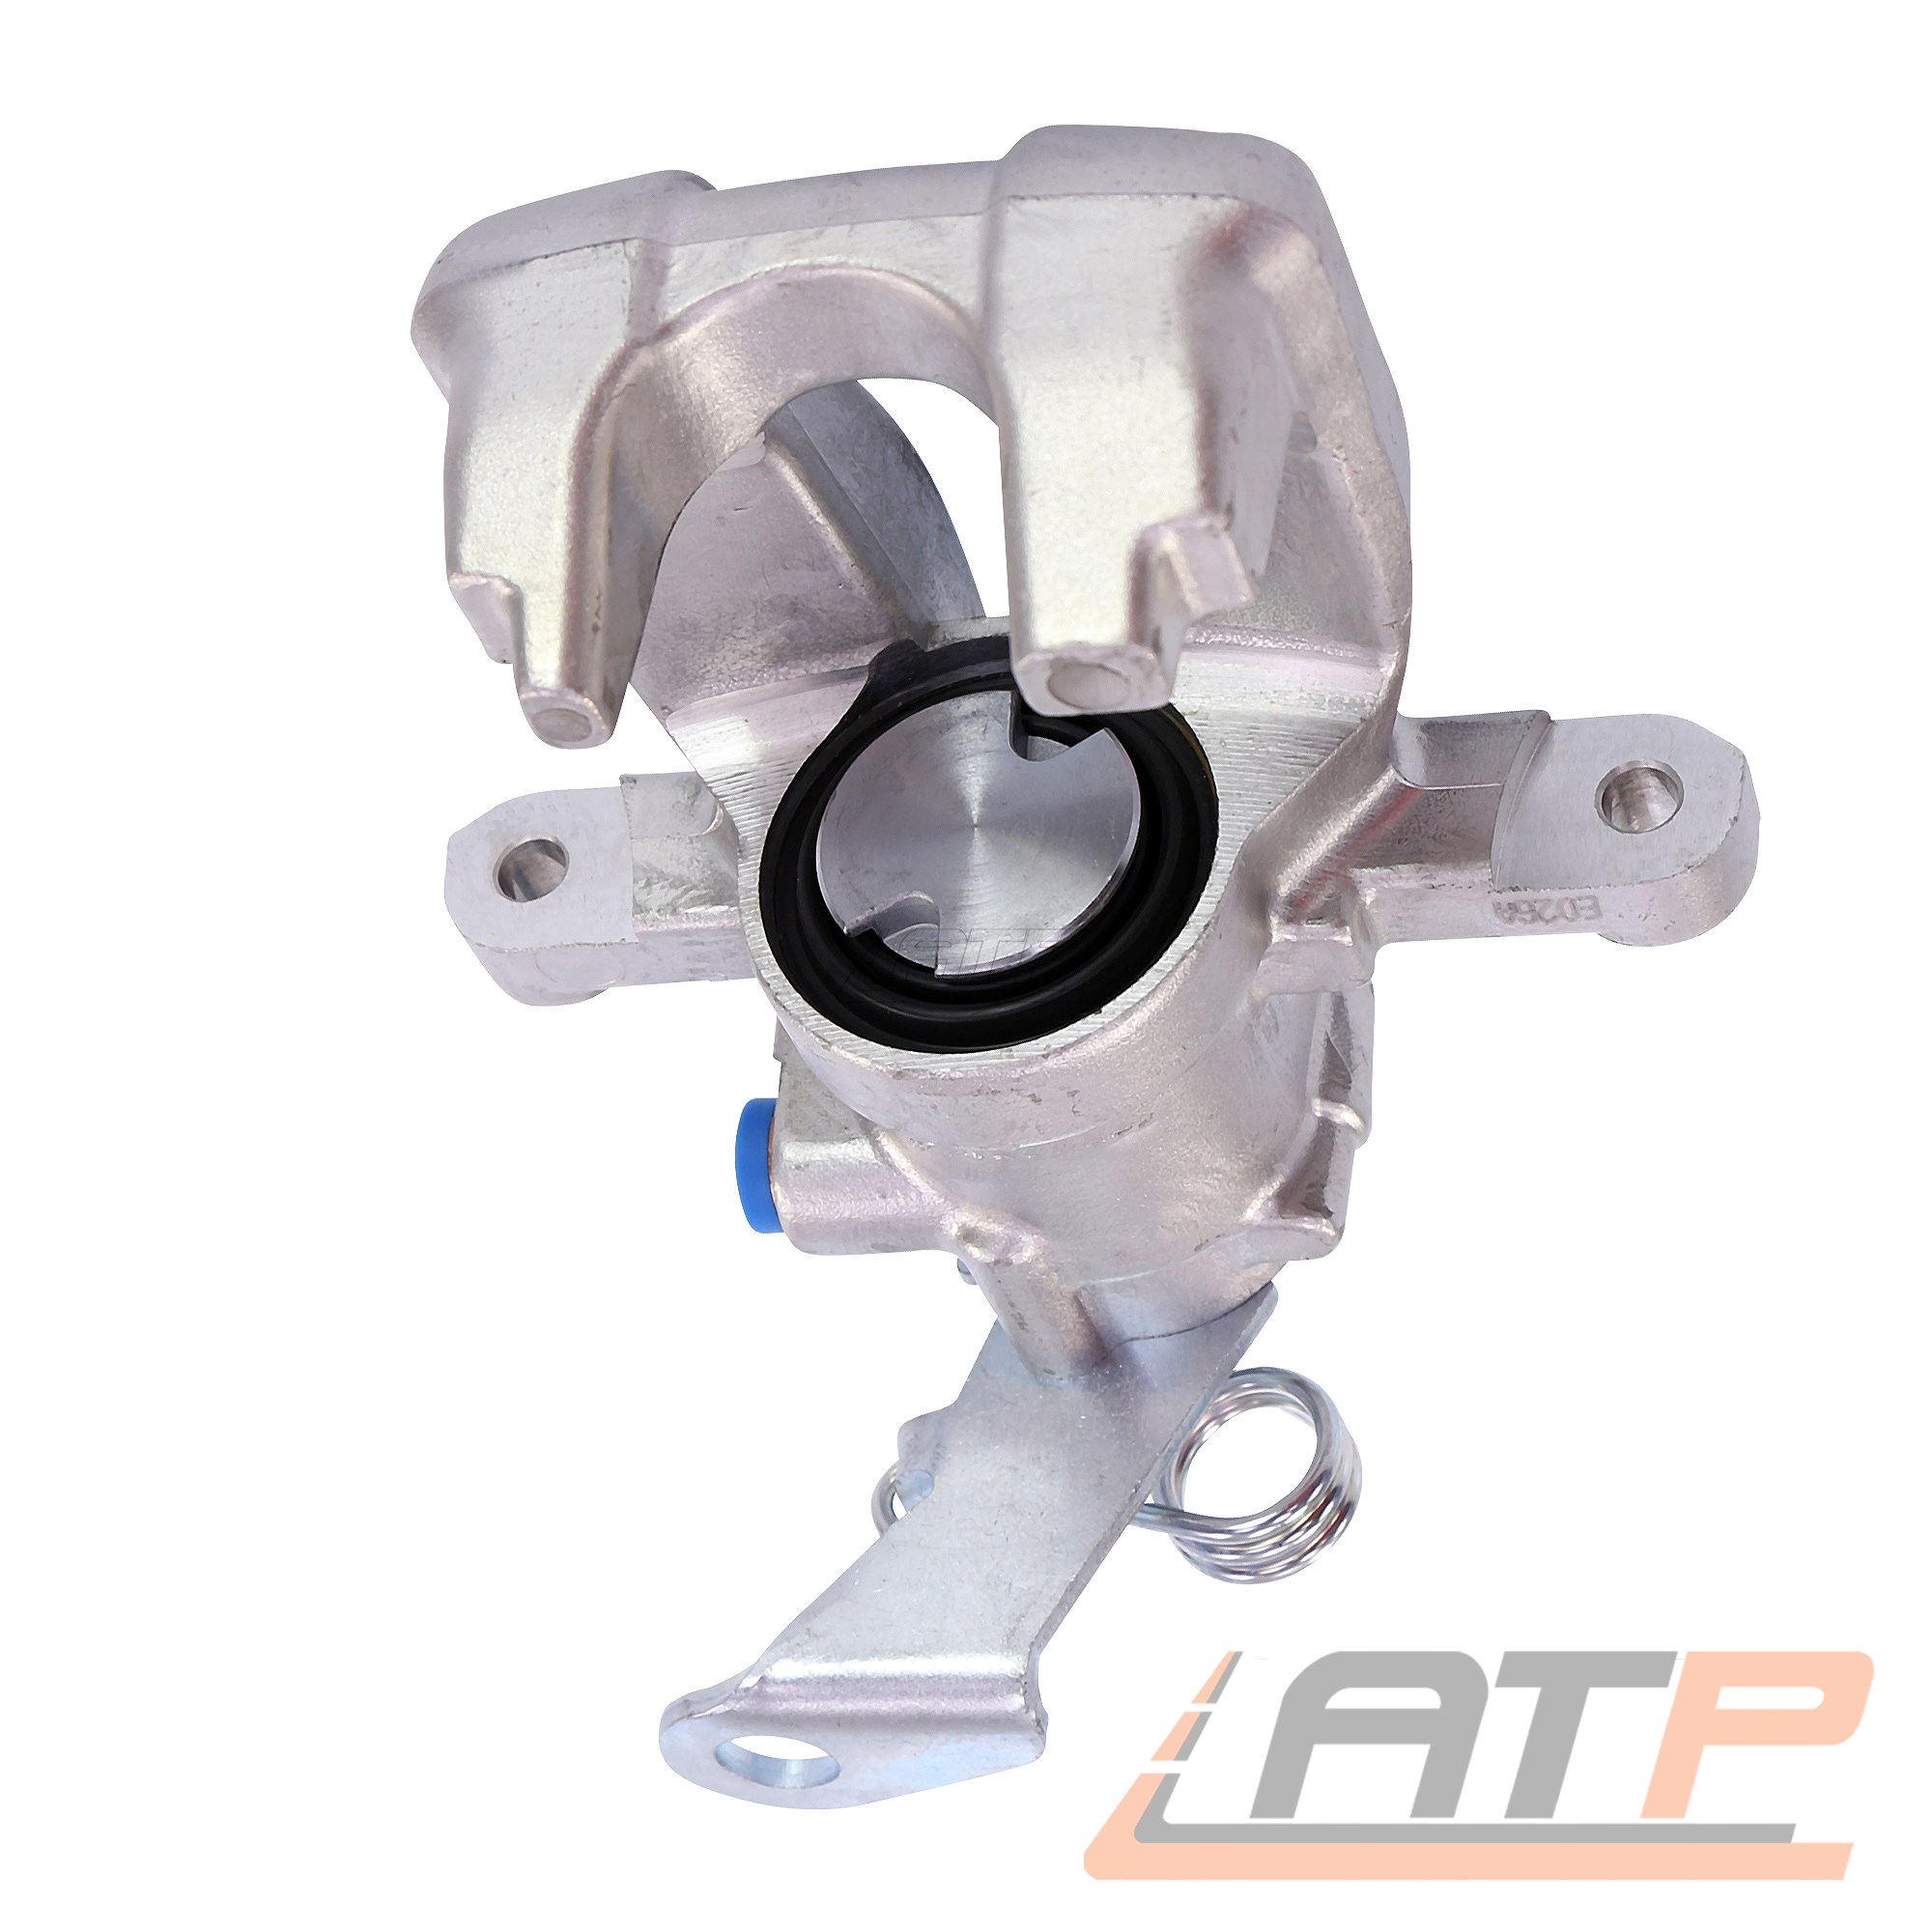 BREMSSATTEL BREMSZANGE HINTEN LINKS OPEL CORSA D 1.4-1.6 Turbo